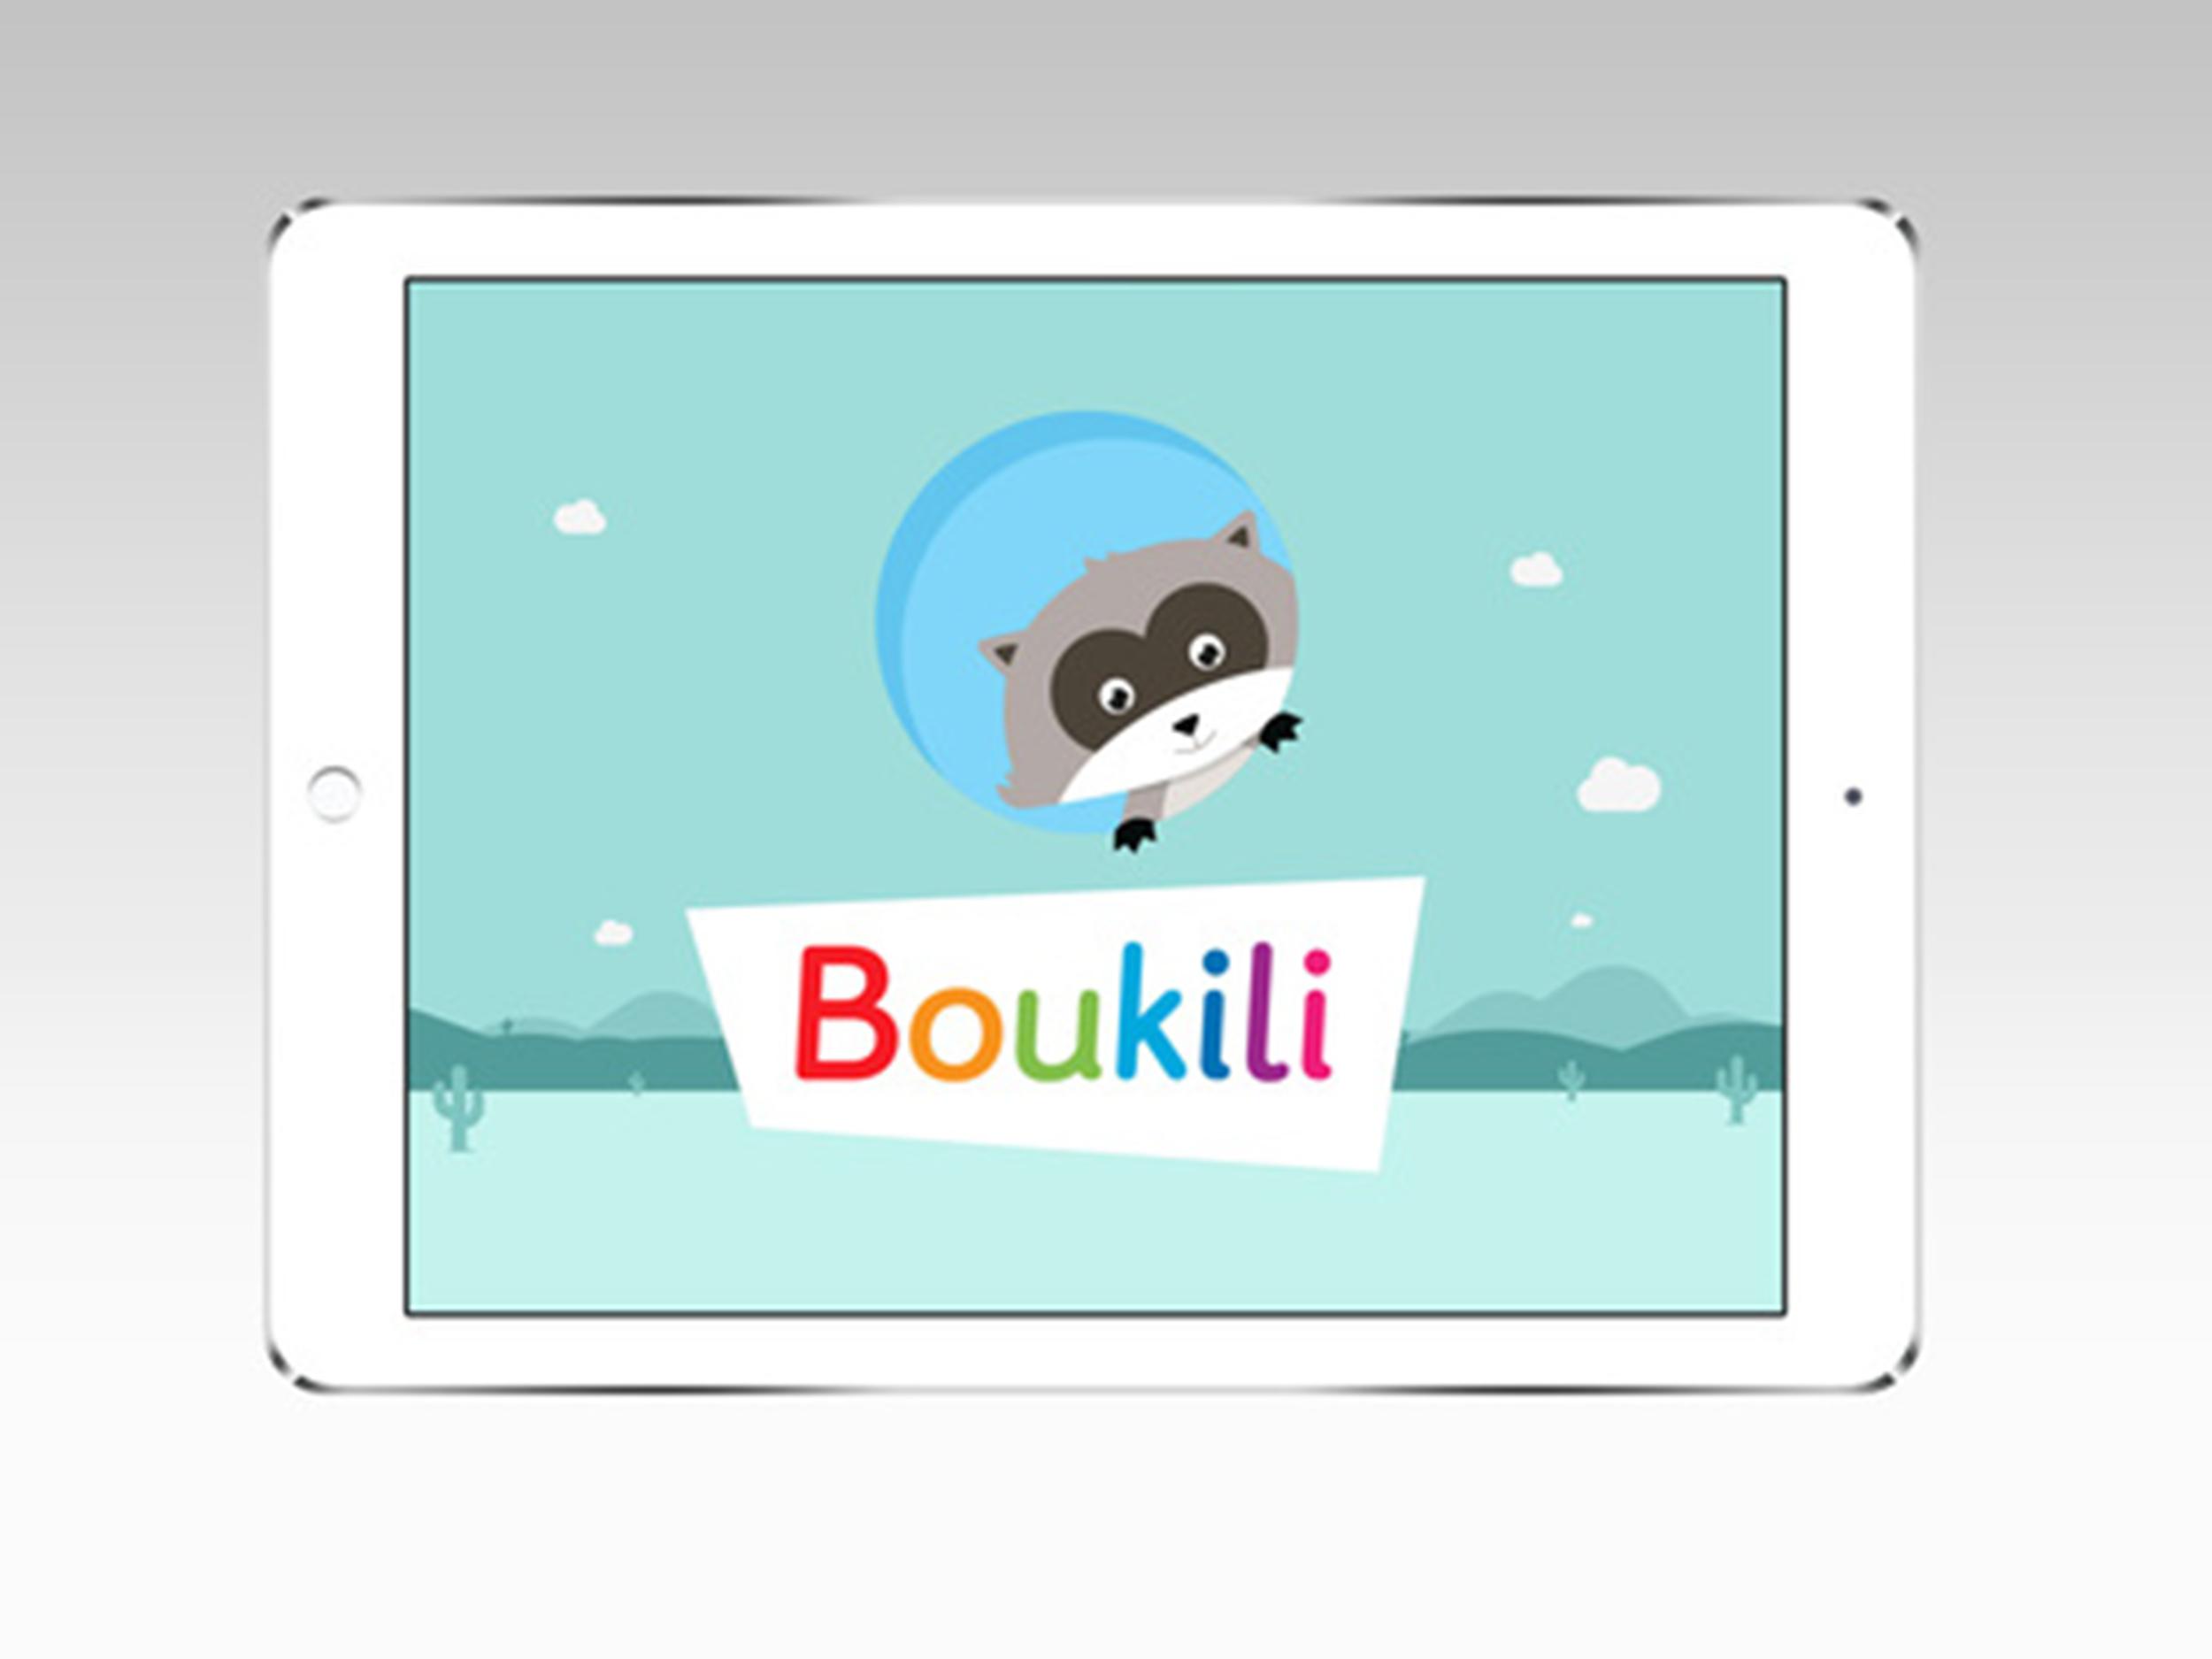 BOukili_9.png